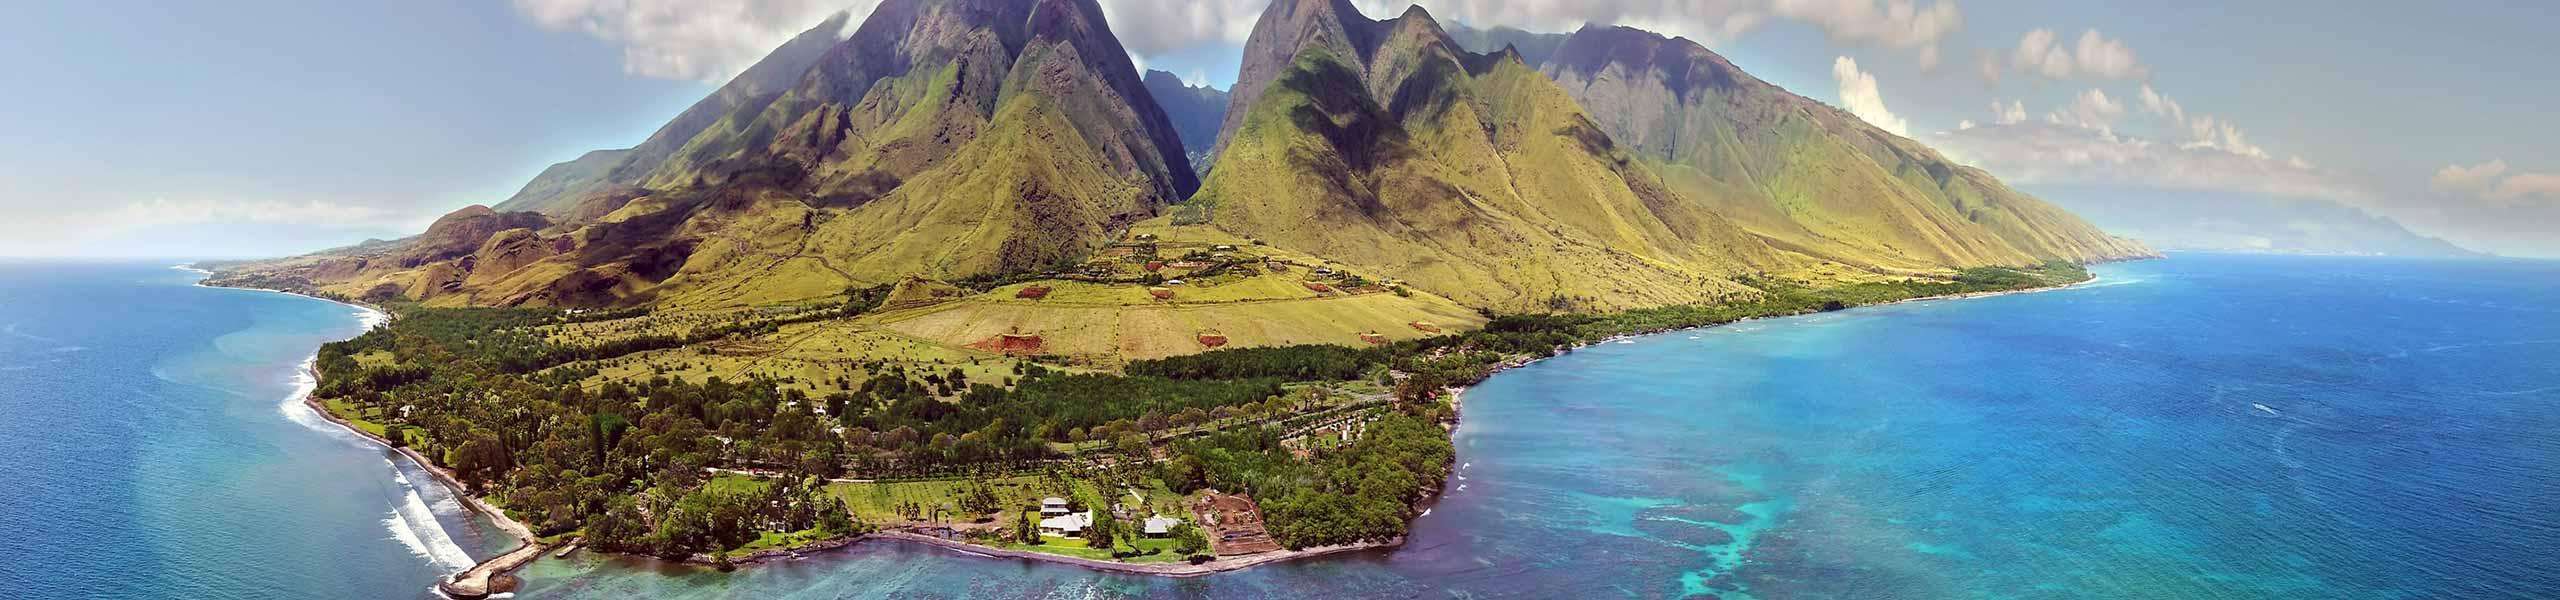 Partner of the Month Mauna Kahalawai Watershed Partnership